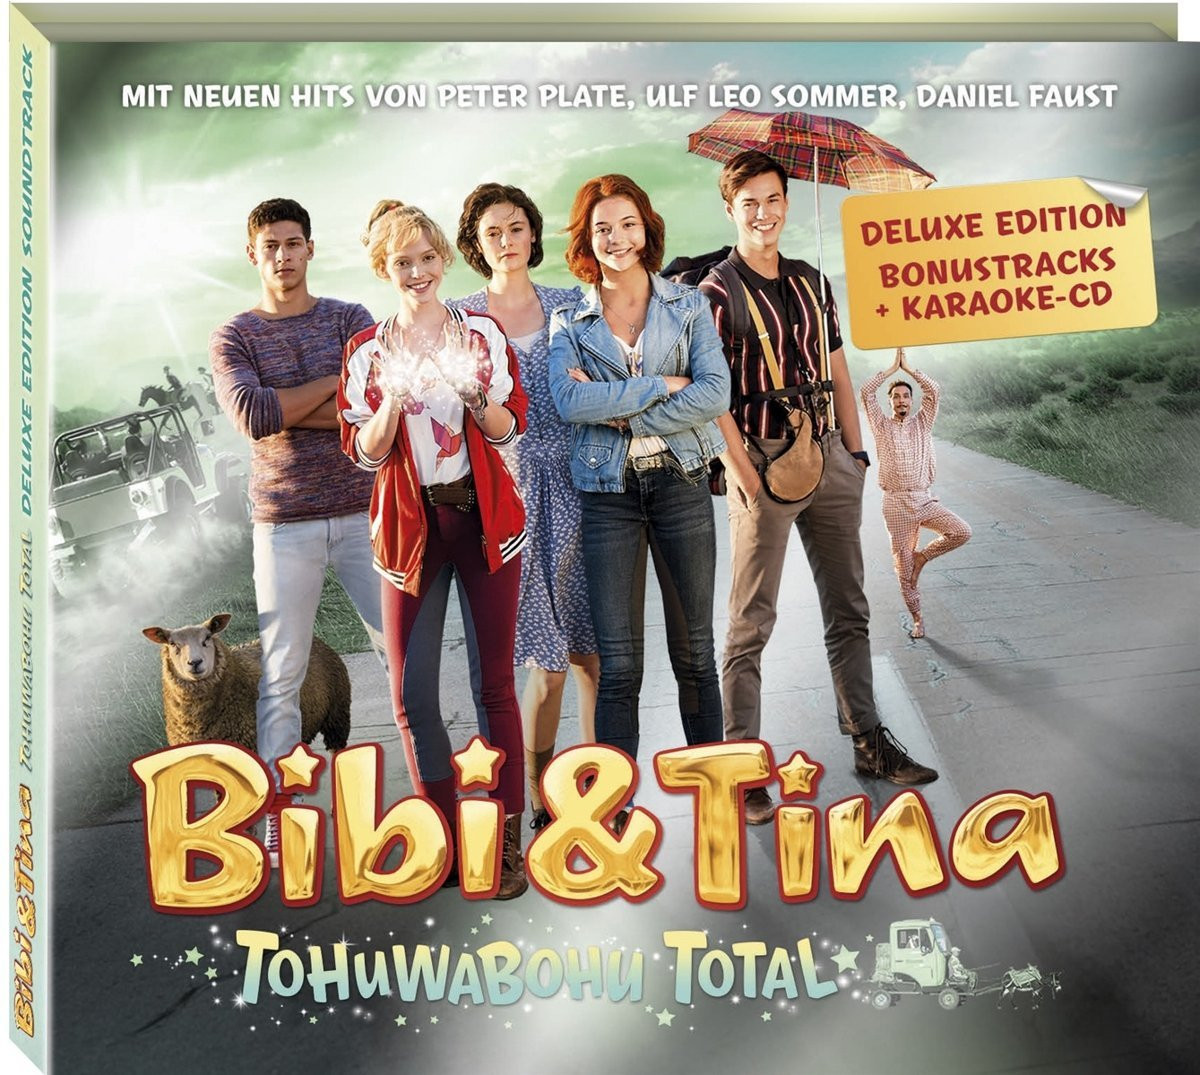 Bibi und Tina - Original Soundtrack zum 4.Kinofilm: Tohuwabohu Total - DELUXE EDITION